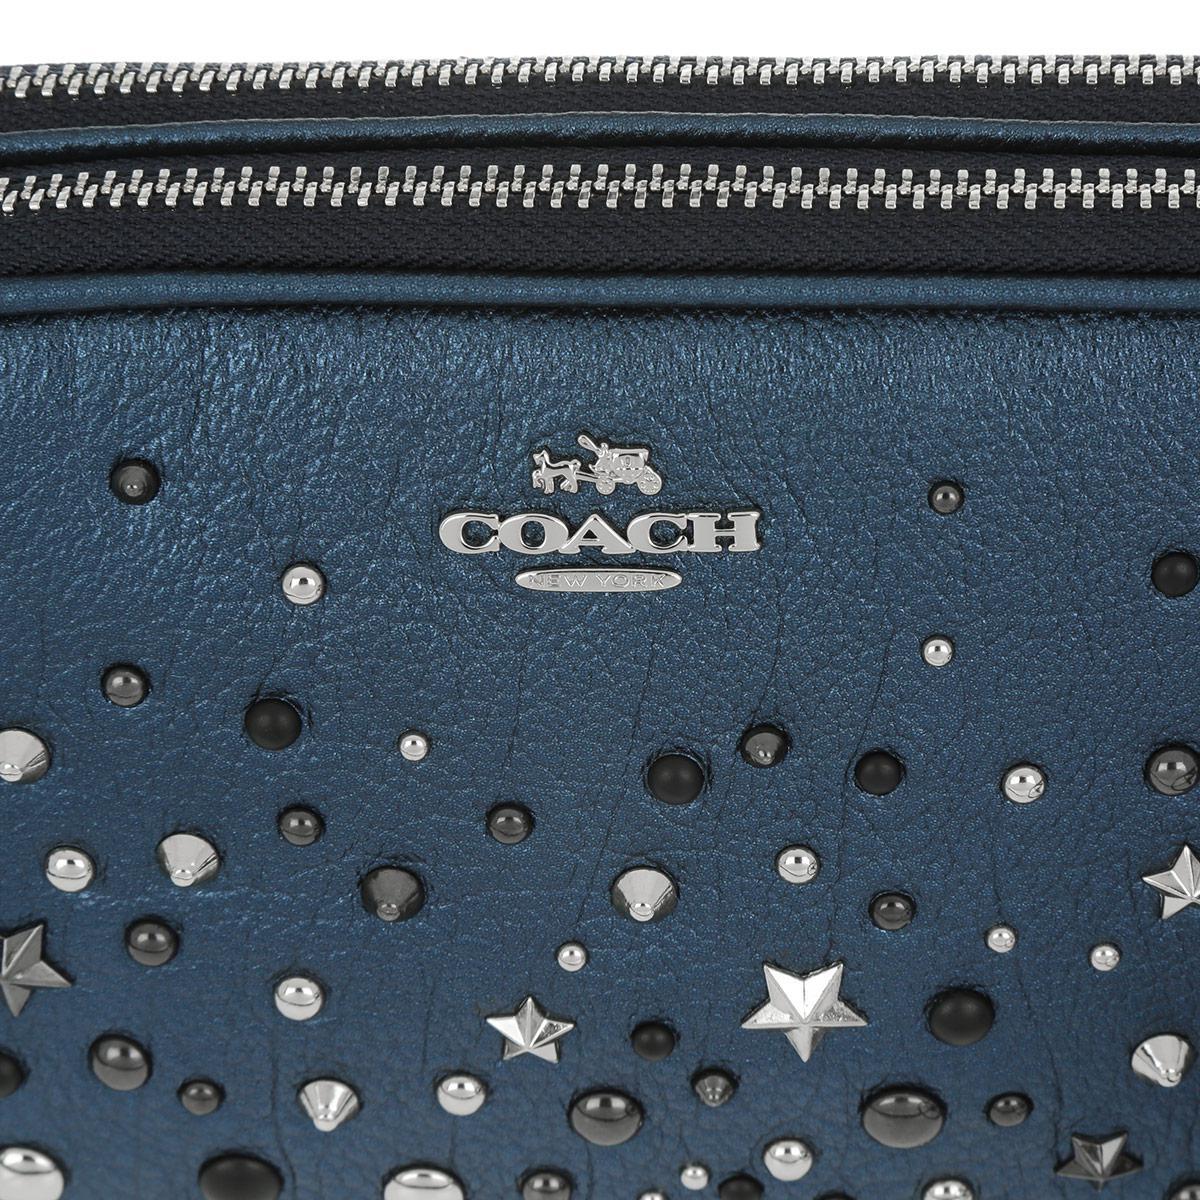 COACH Leather Metallic Crossbody Bag Metallic Blue